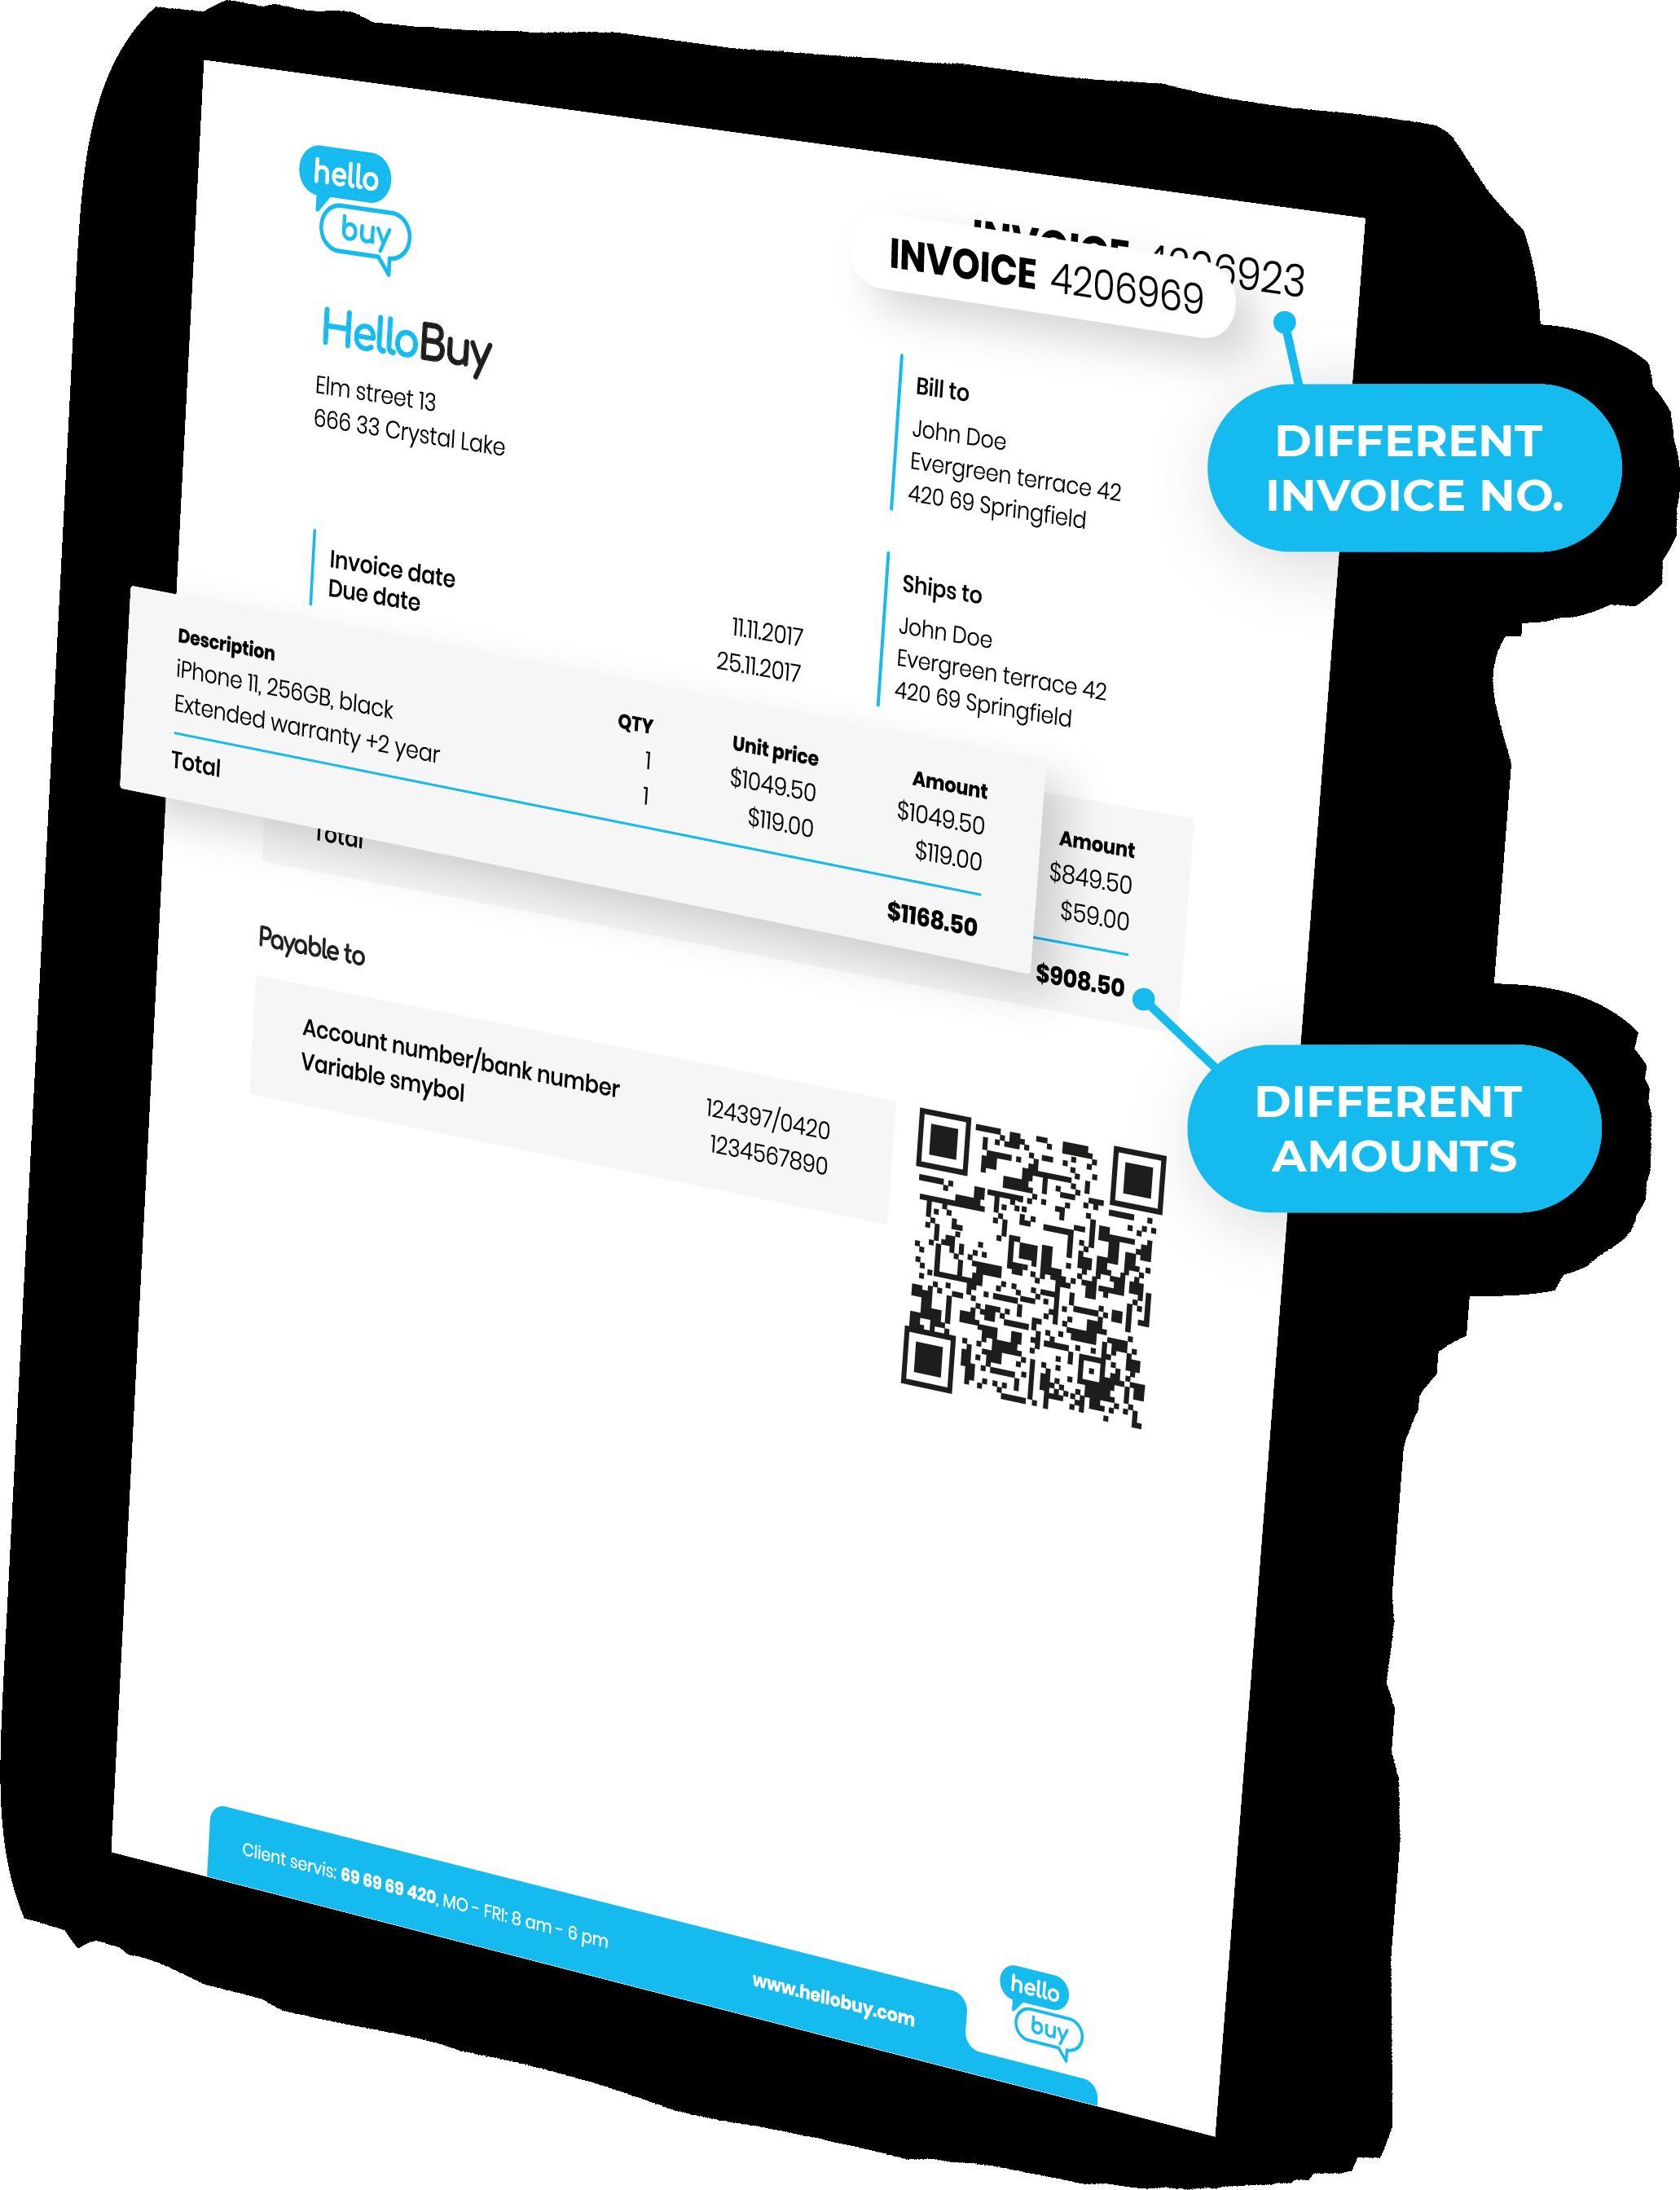 Invoice changes detection